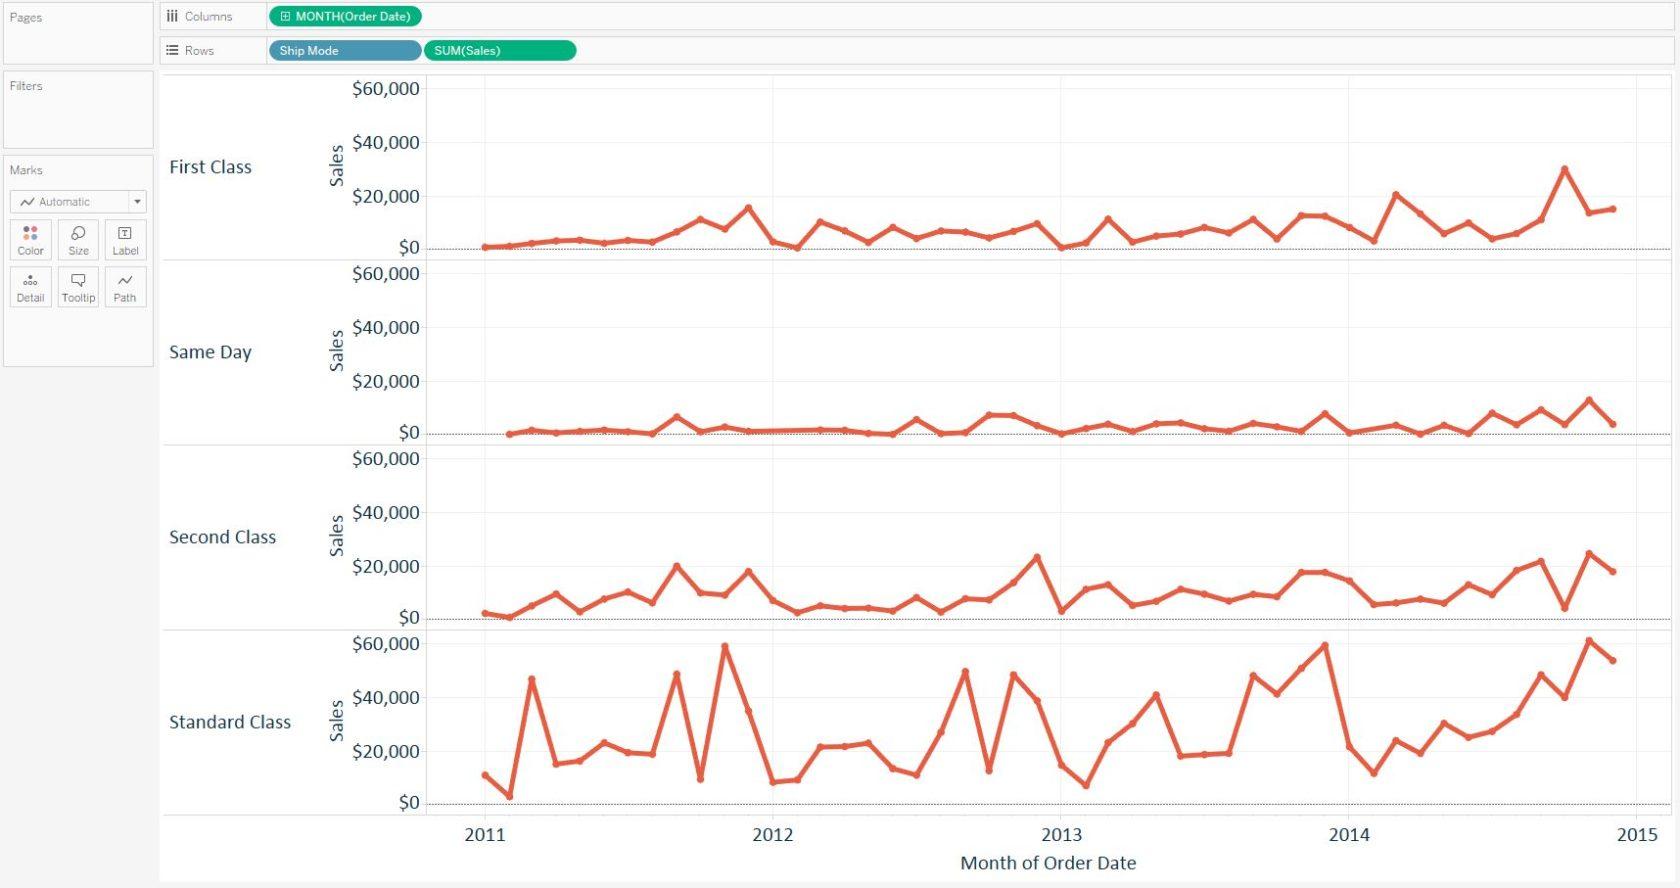 Tableau Line Graph by Ship Mode